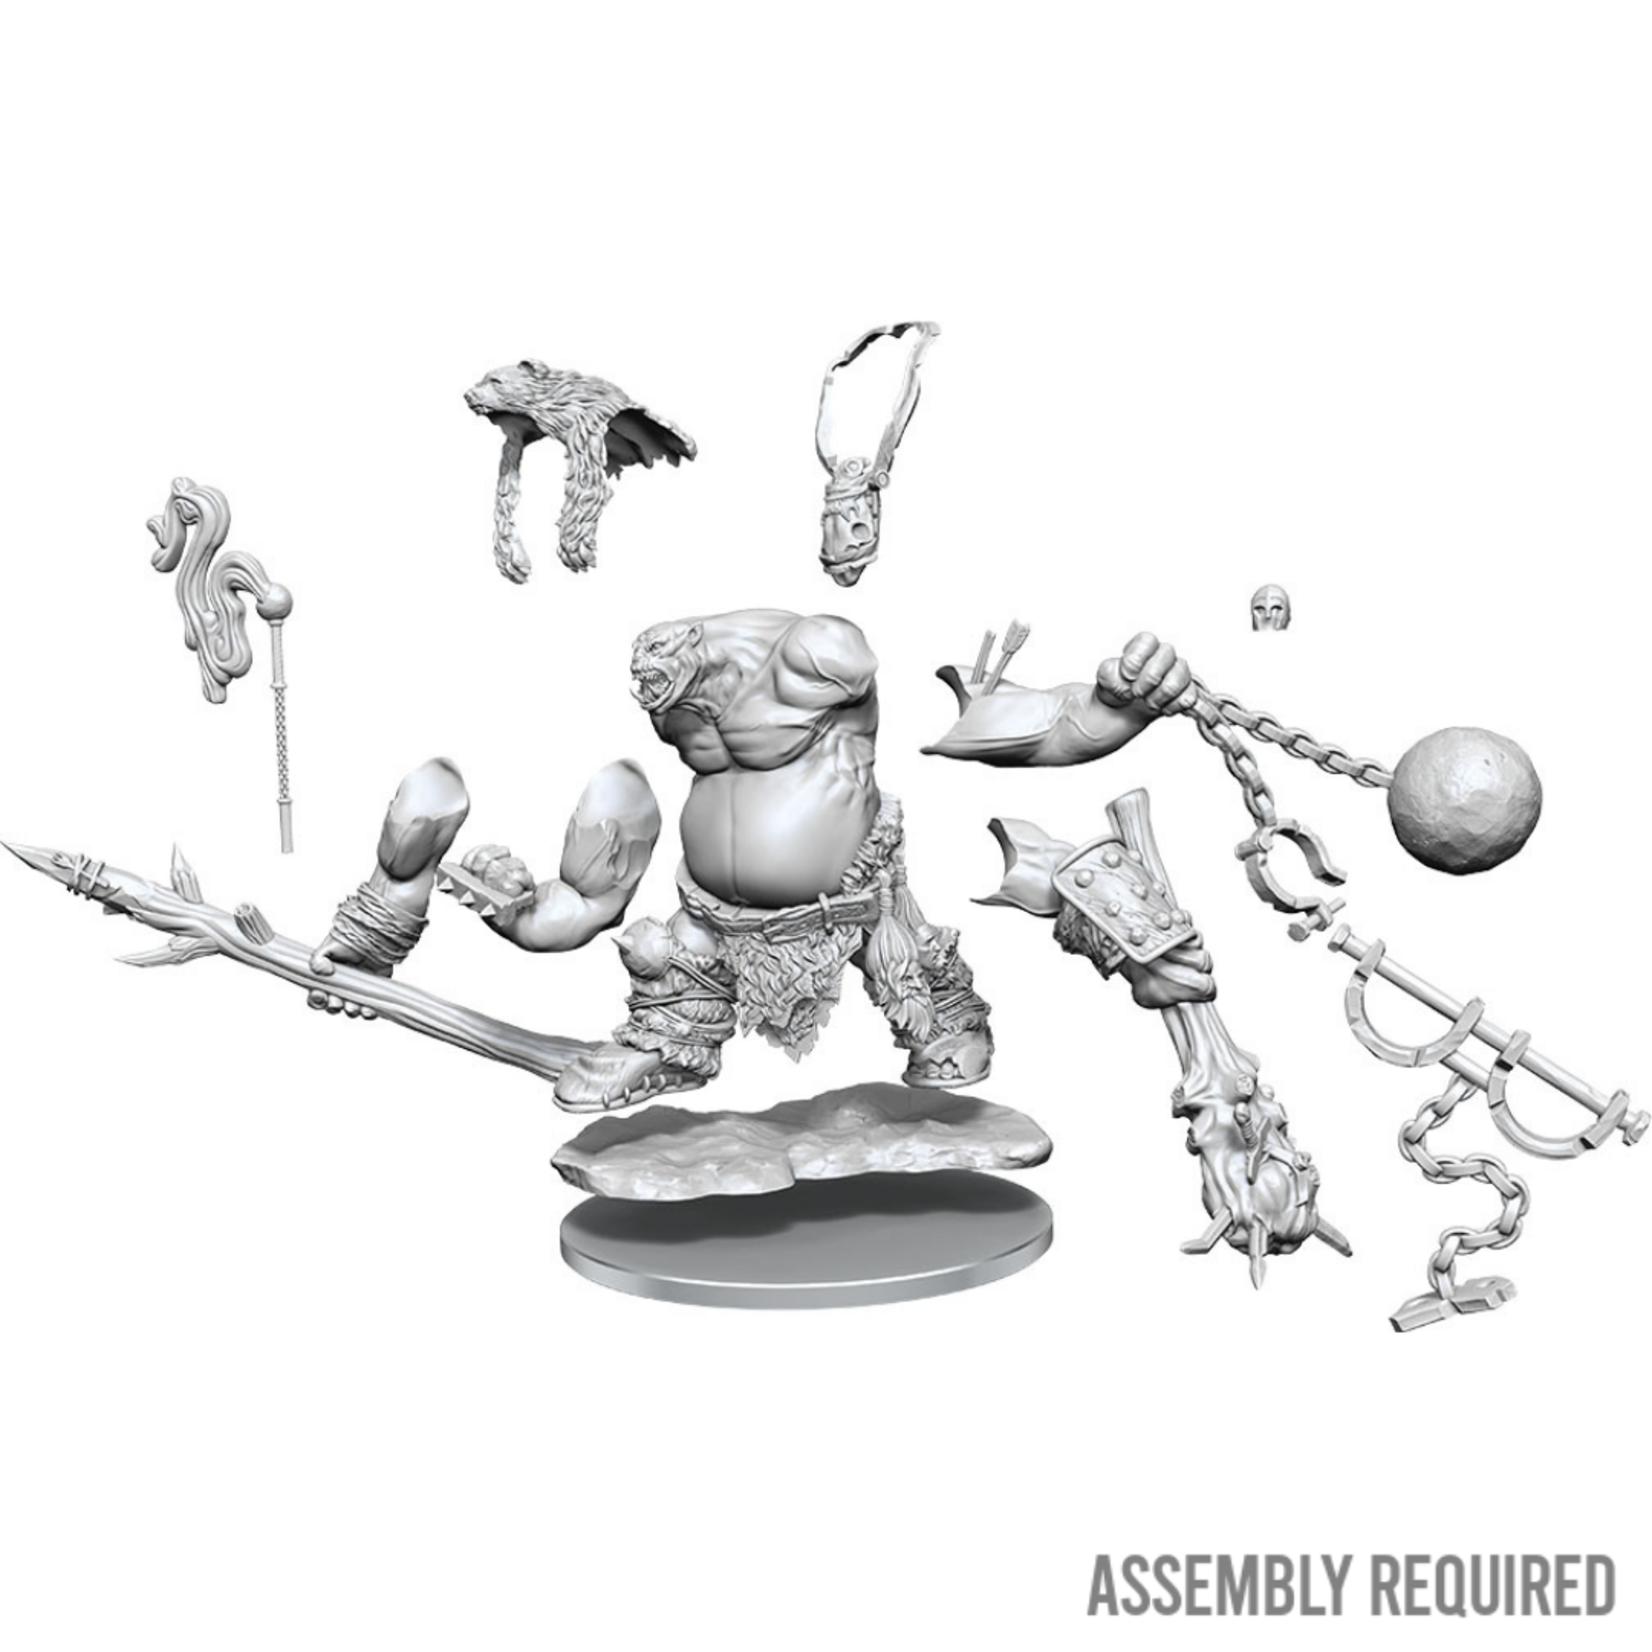 WizKids Wizkids Dungeons and Dragons Frameworks: Ogre W01 (Preorder)